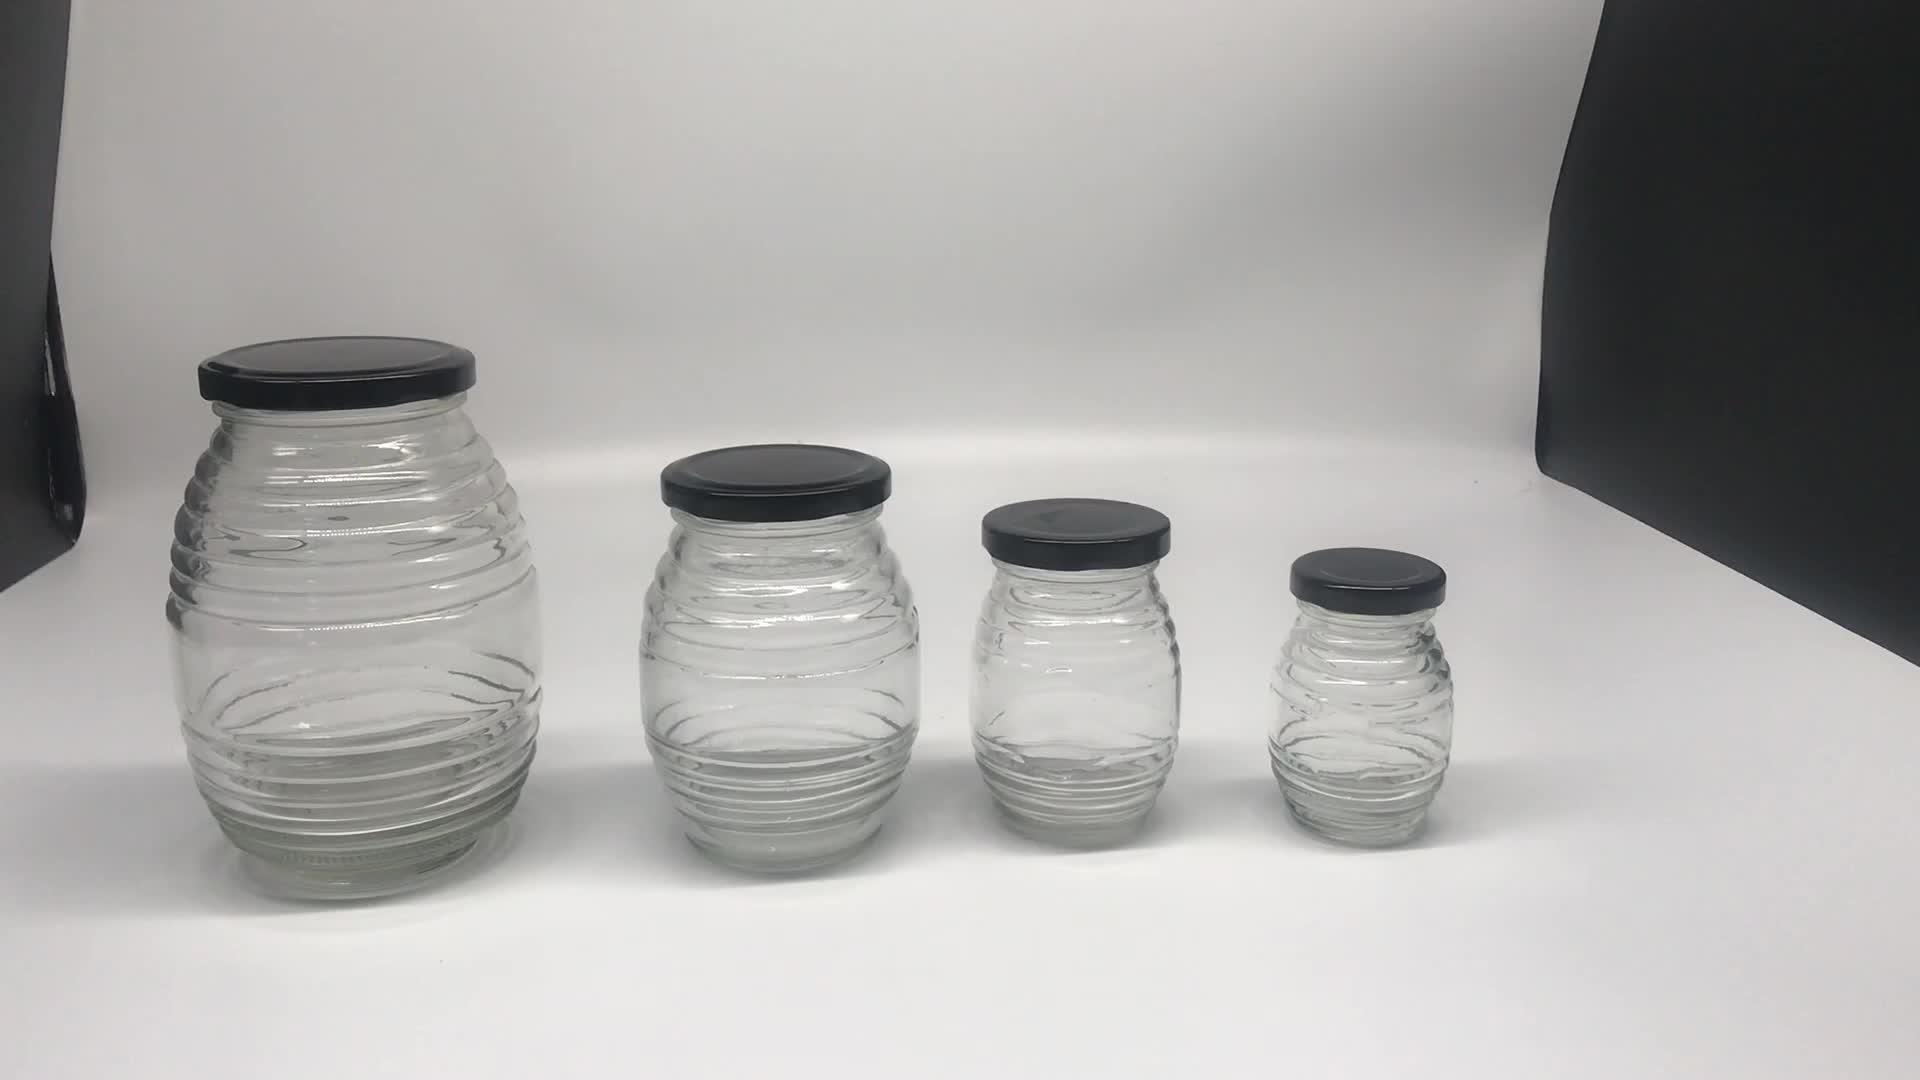 100ml 180ml 380ml 730ml เกลียว Bee รูปร่างแก้วน้ำผึ้ง Jar พร้อมสกรูฝาปิด,แฟนซีด้ายรอบรูปร่างแก้วขวด Jar